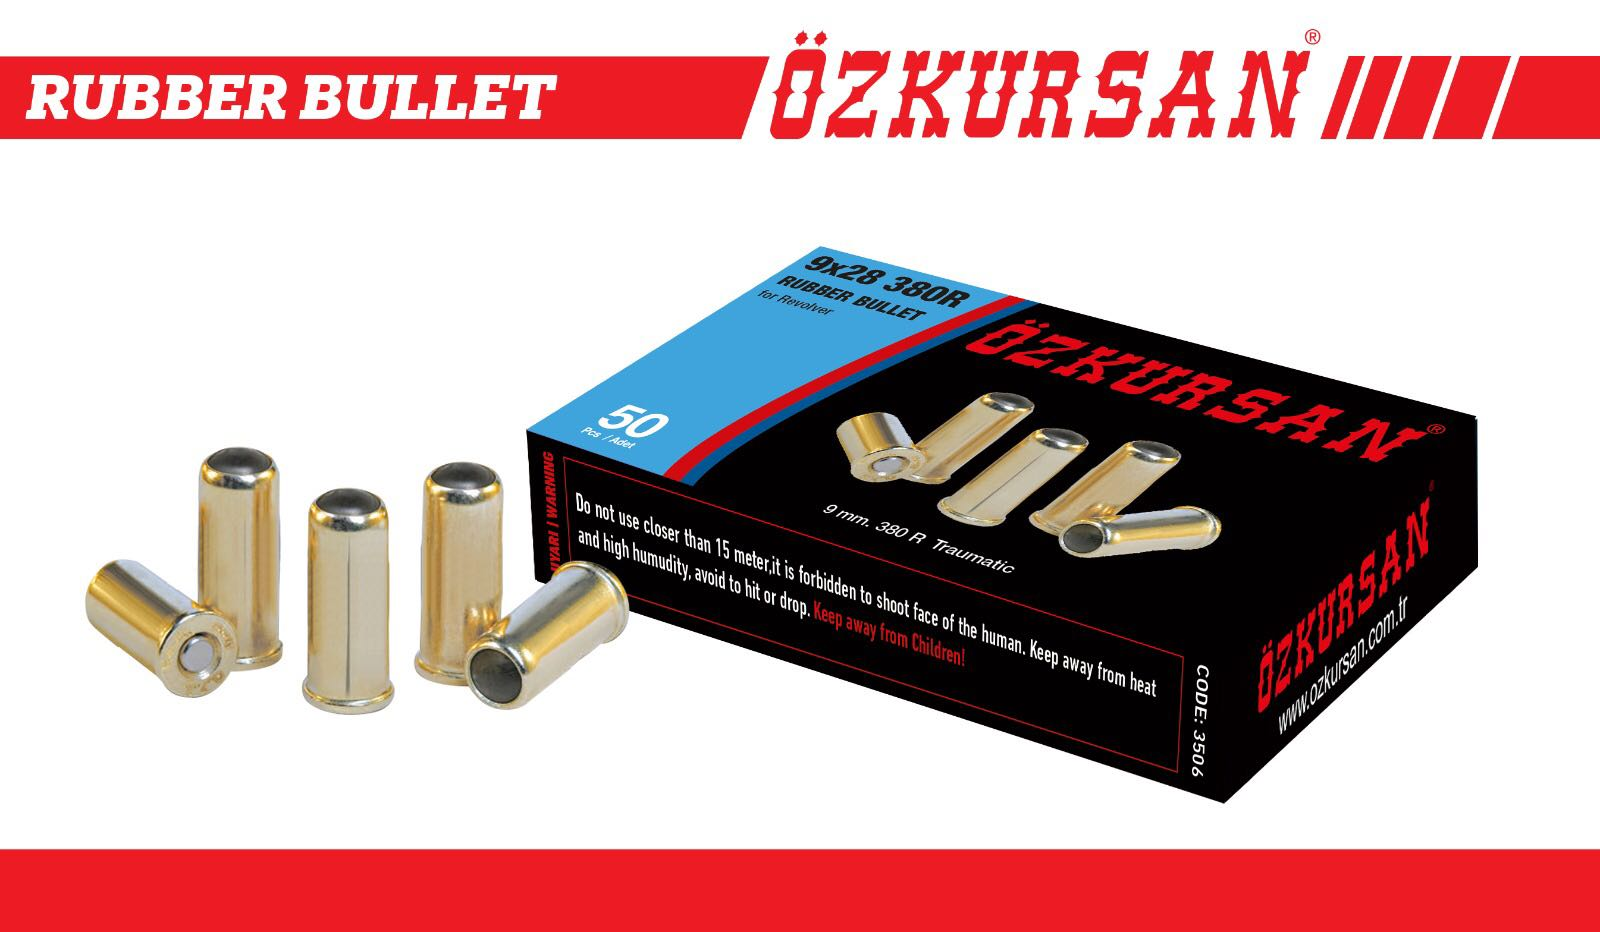 Traumatik tabanca mermisi veya Travmatik tabanca mermisi, Rubber Bullet, Traumatik Pistol